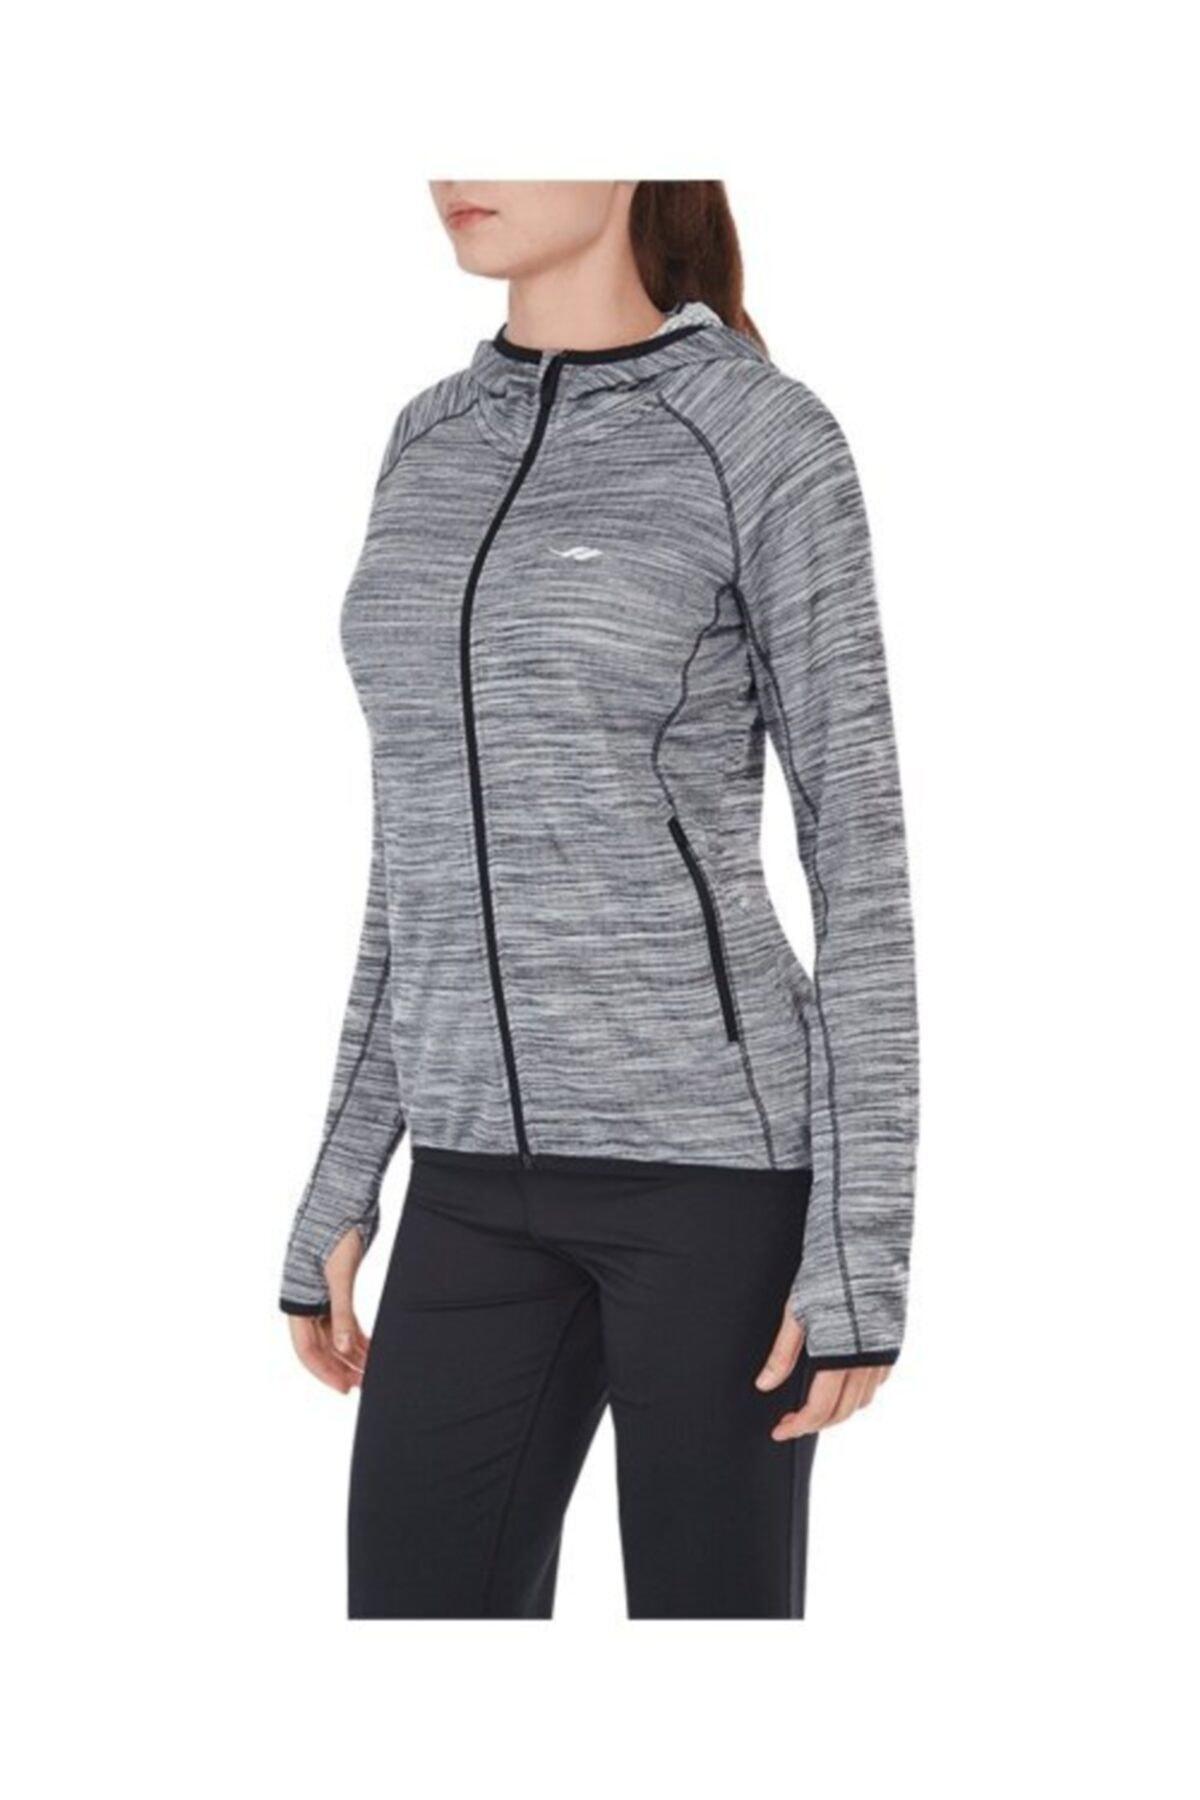 Lescon Kadın Gri Siyah Fermuarlı Sweatshirt 17n-2028 1